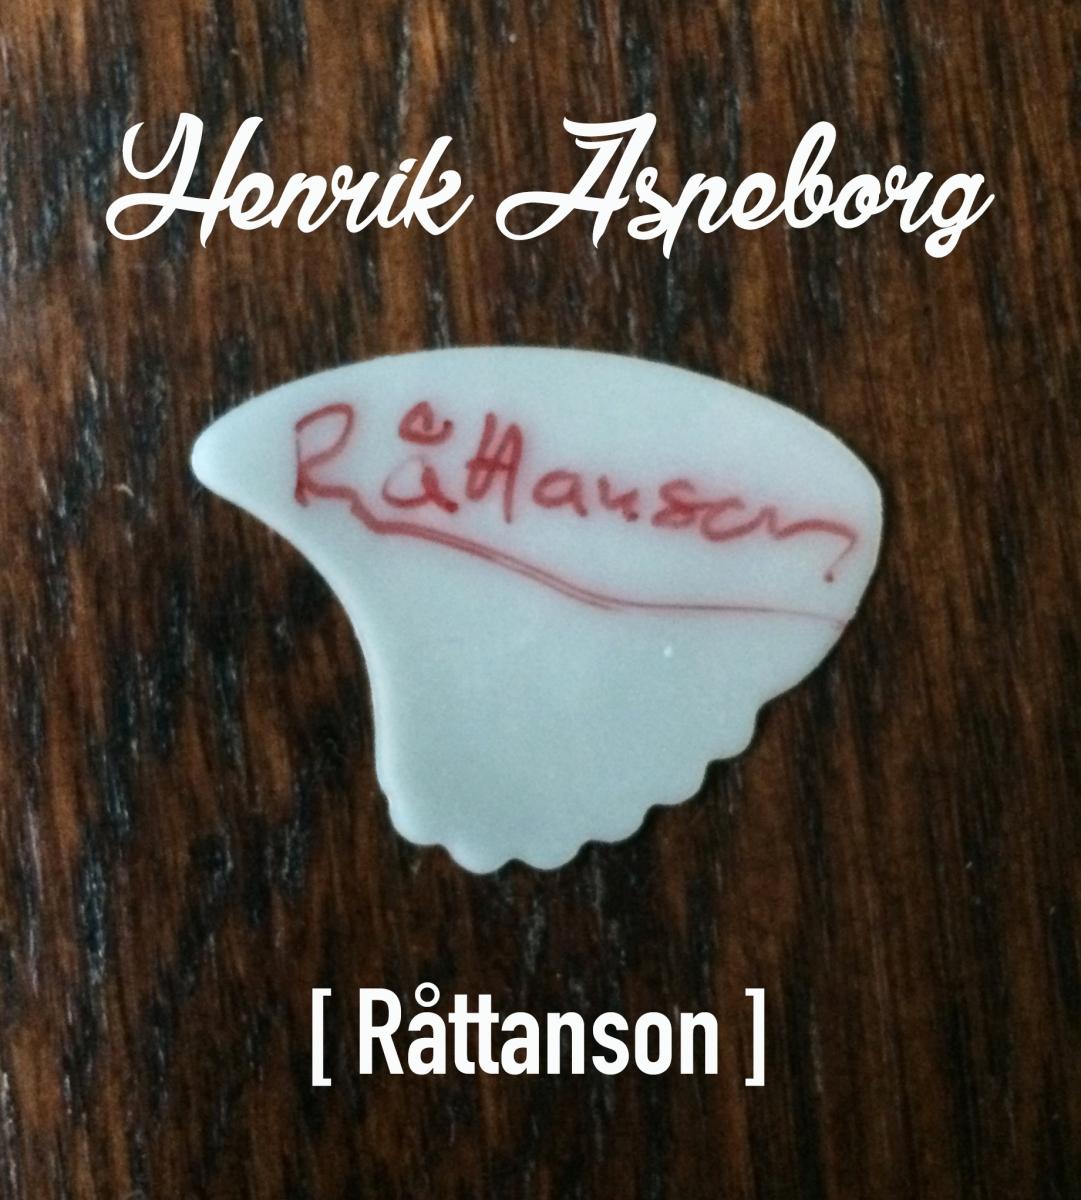 Henrik Aspeborg